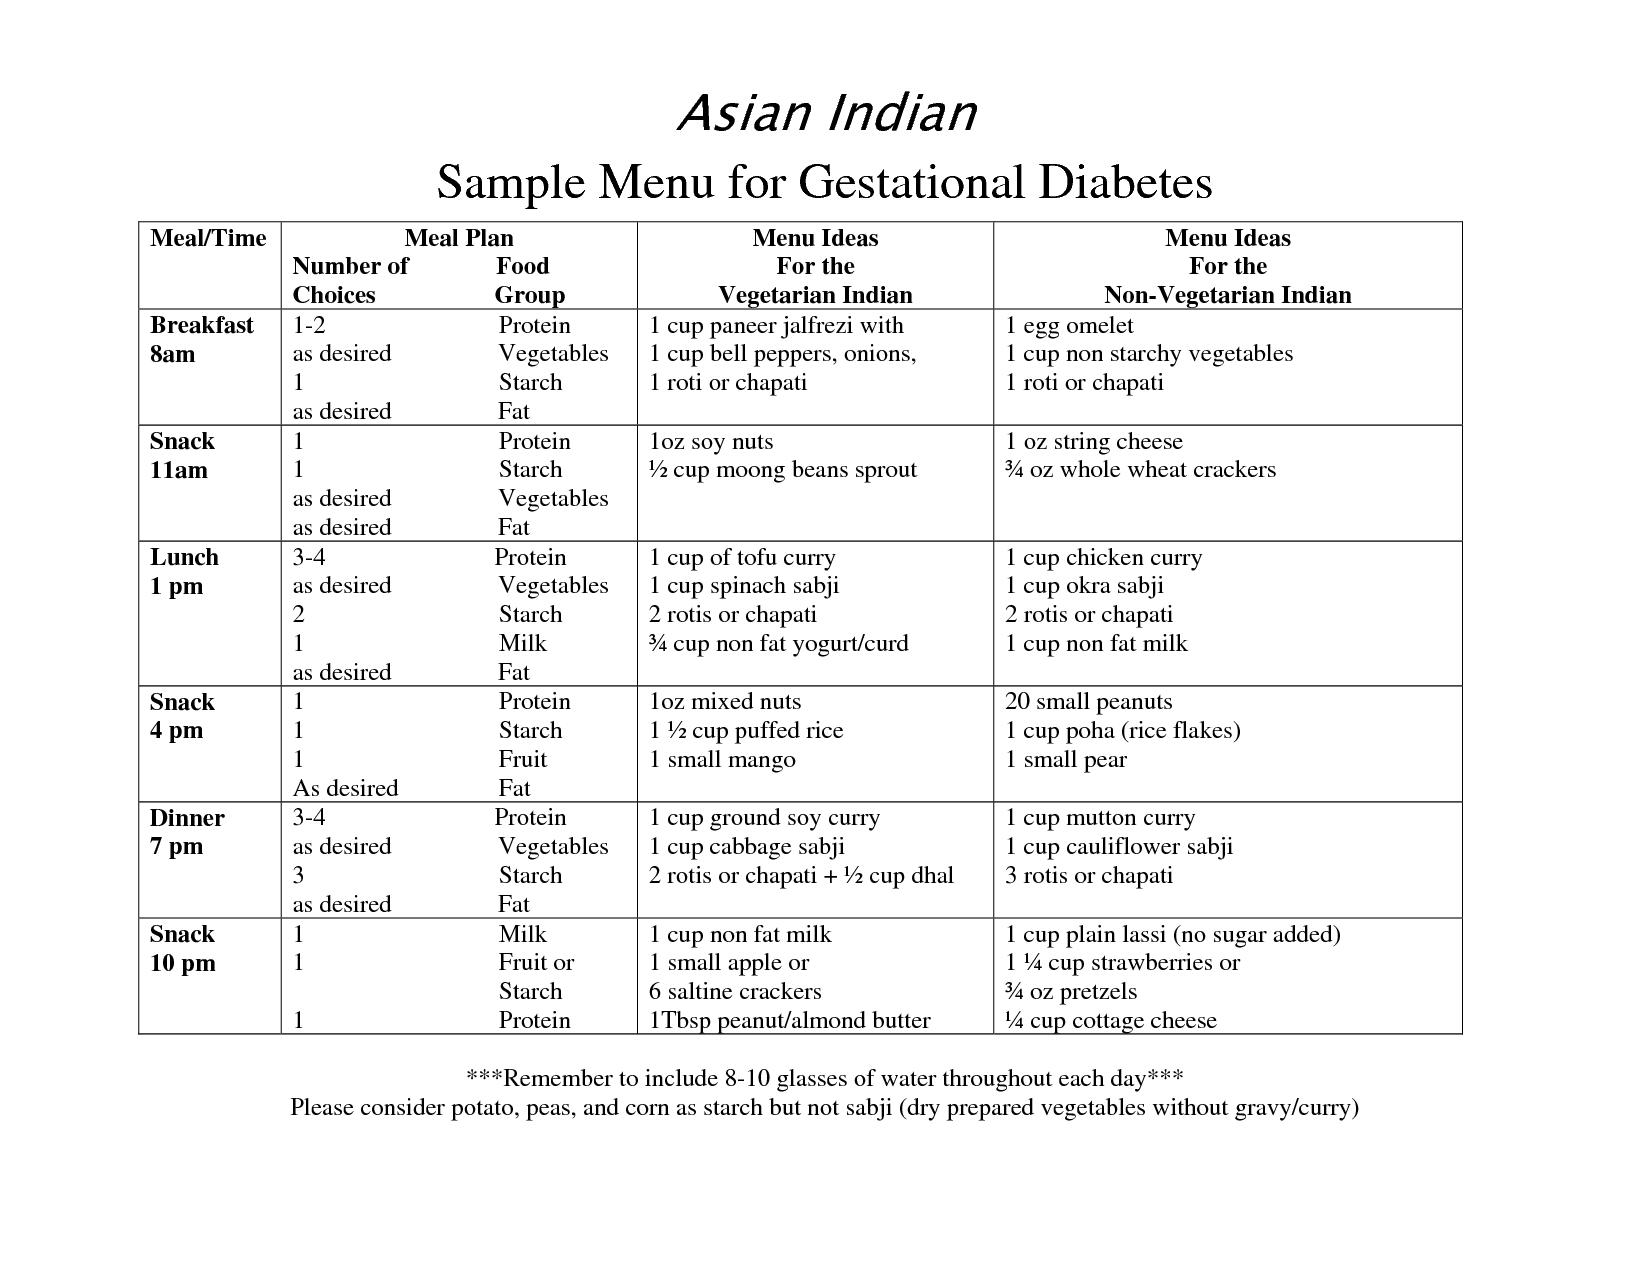 Ayurveda And Diabetes During Pregnancy Gestational